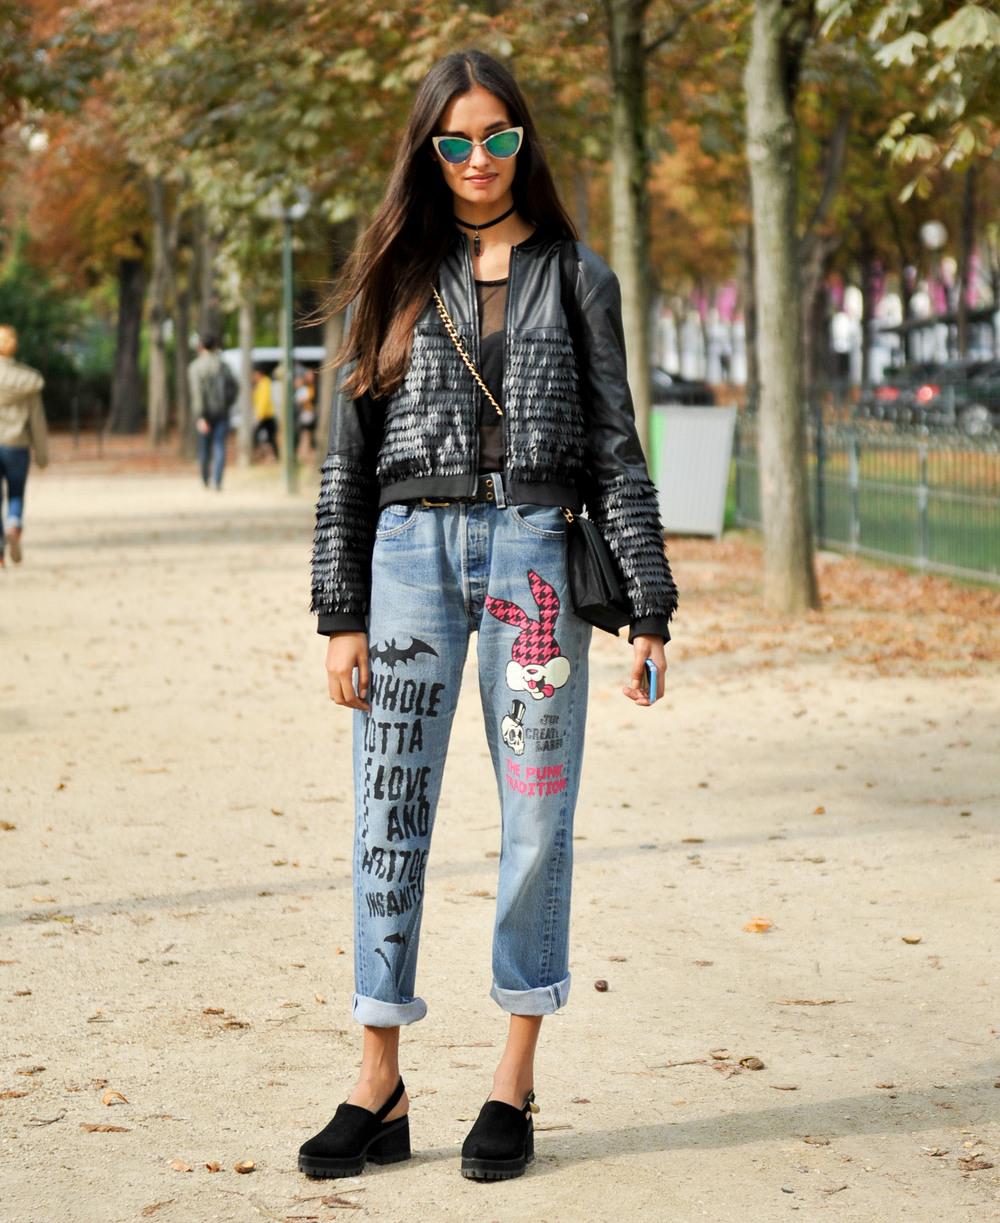 StreetStyle_ParisFashionWeek_LeandroJusten_029.jpg